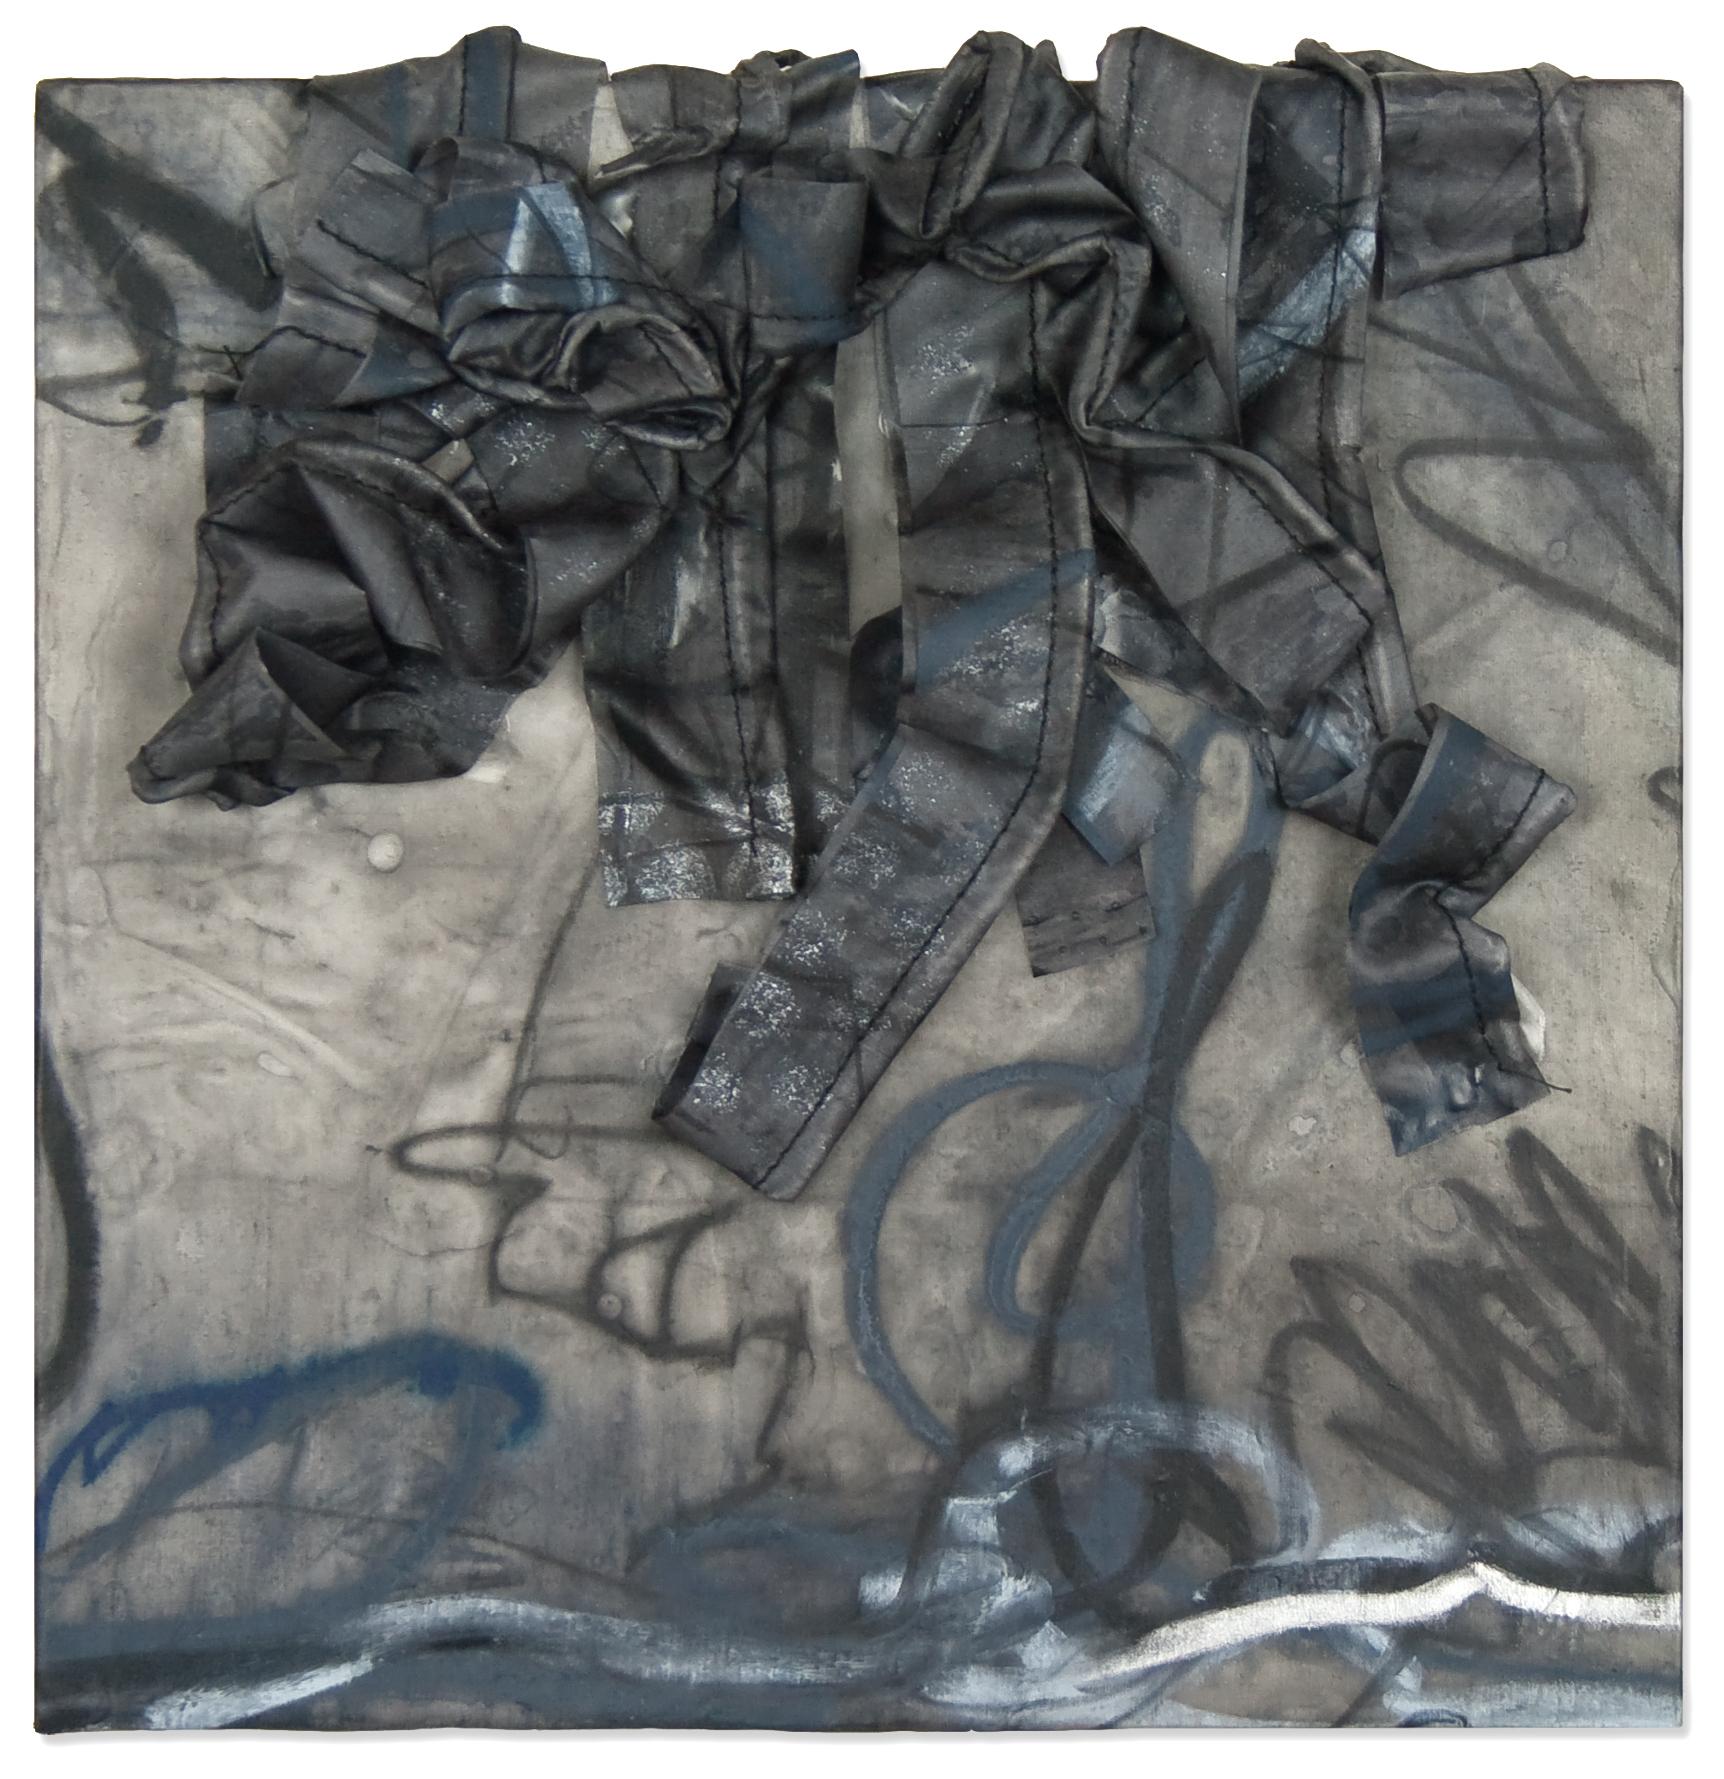 Winiarski_Untitled_No.6_Black_and_Grey.jpg